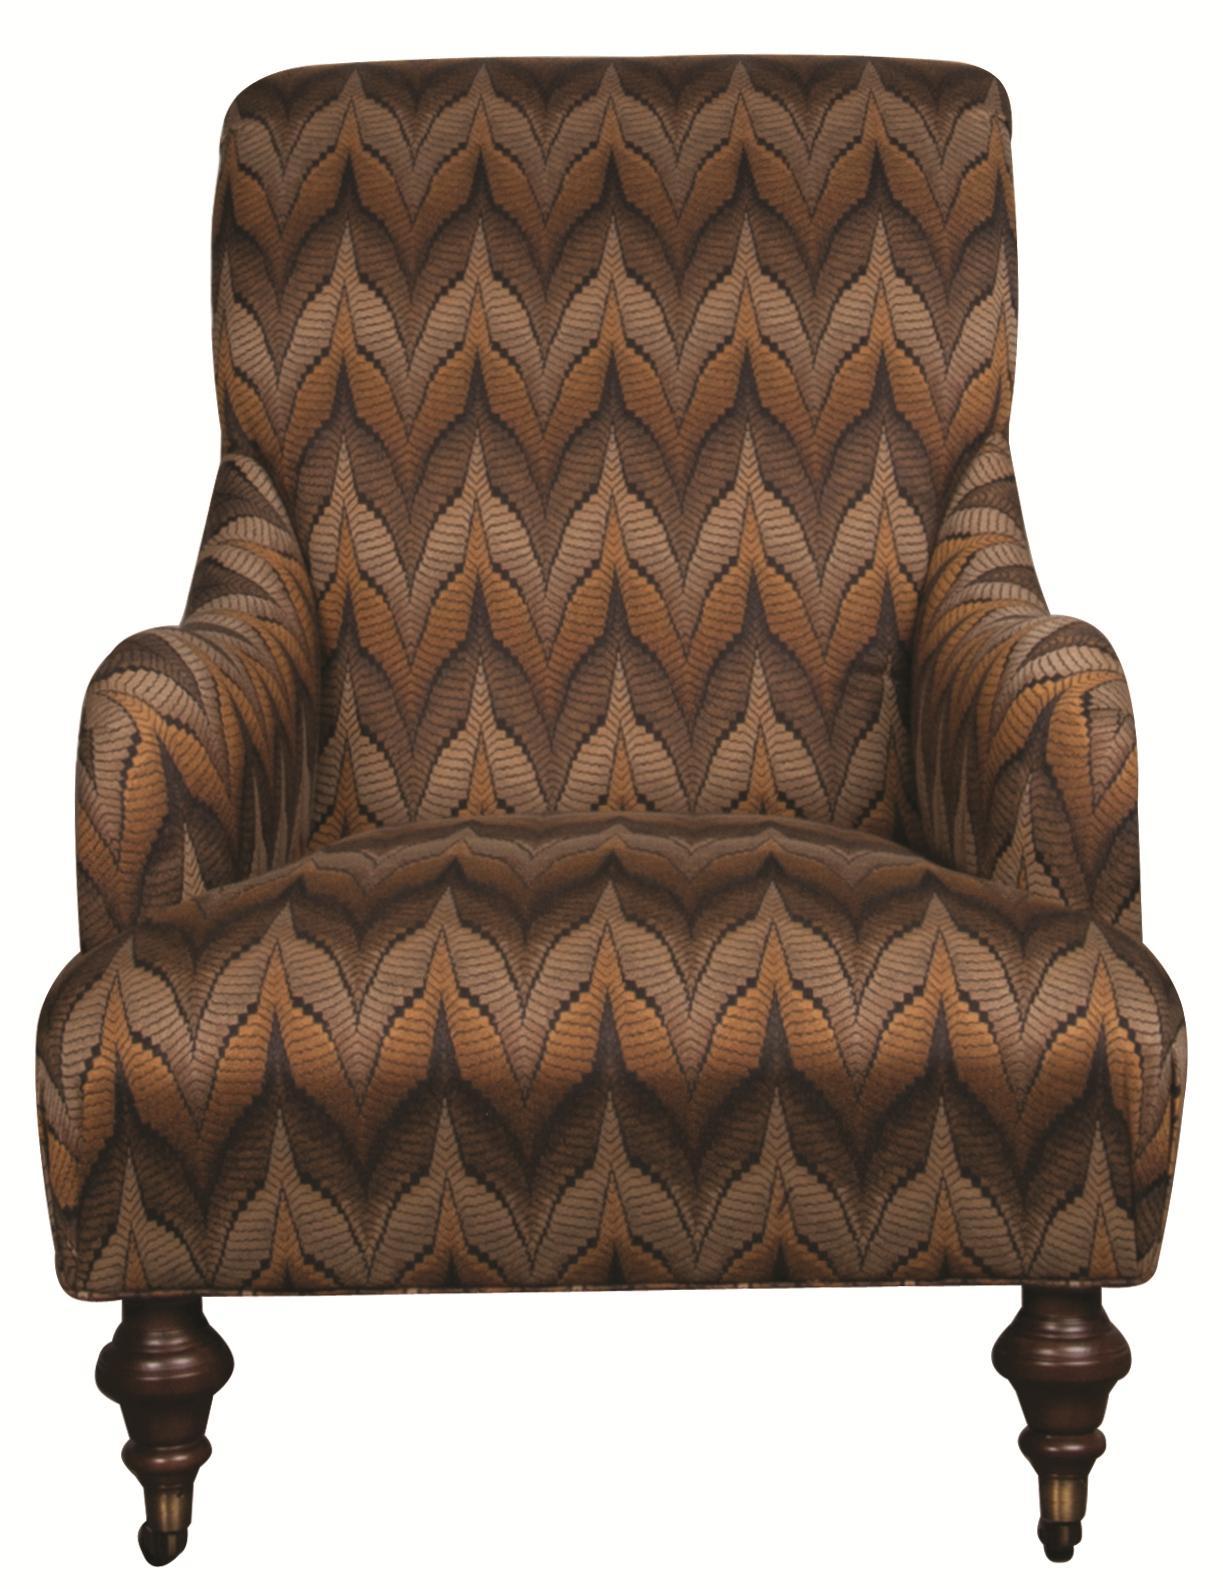 Morris Home Jaqueline Jaqueline Accent Chair - Item Number: 110278860